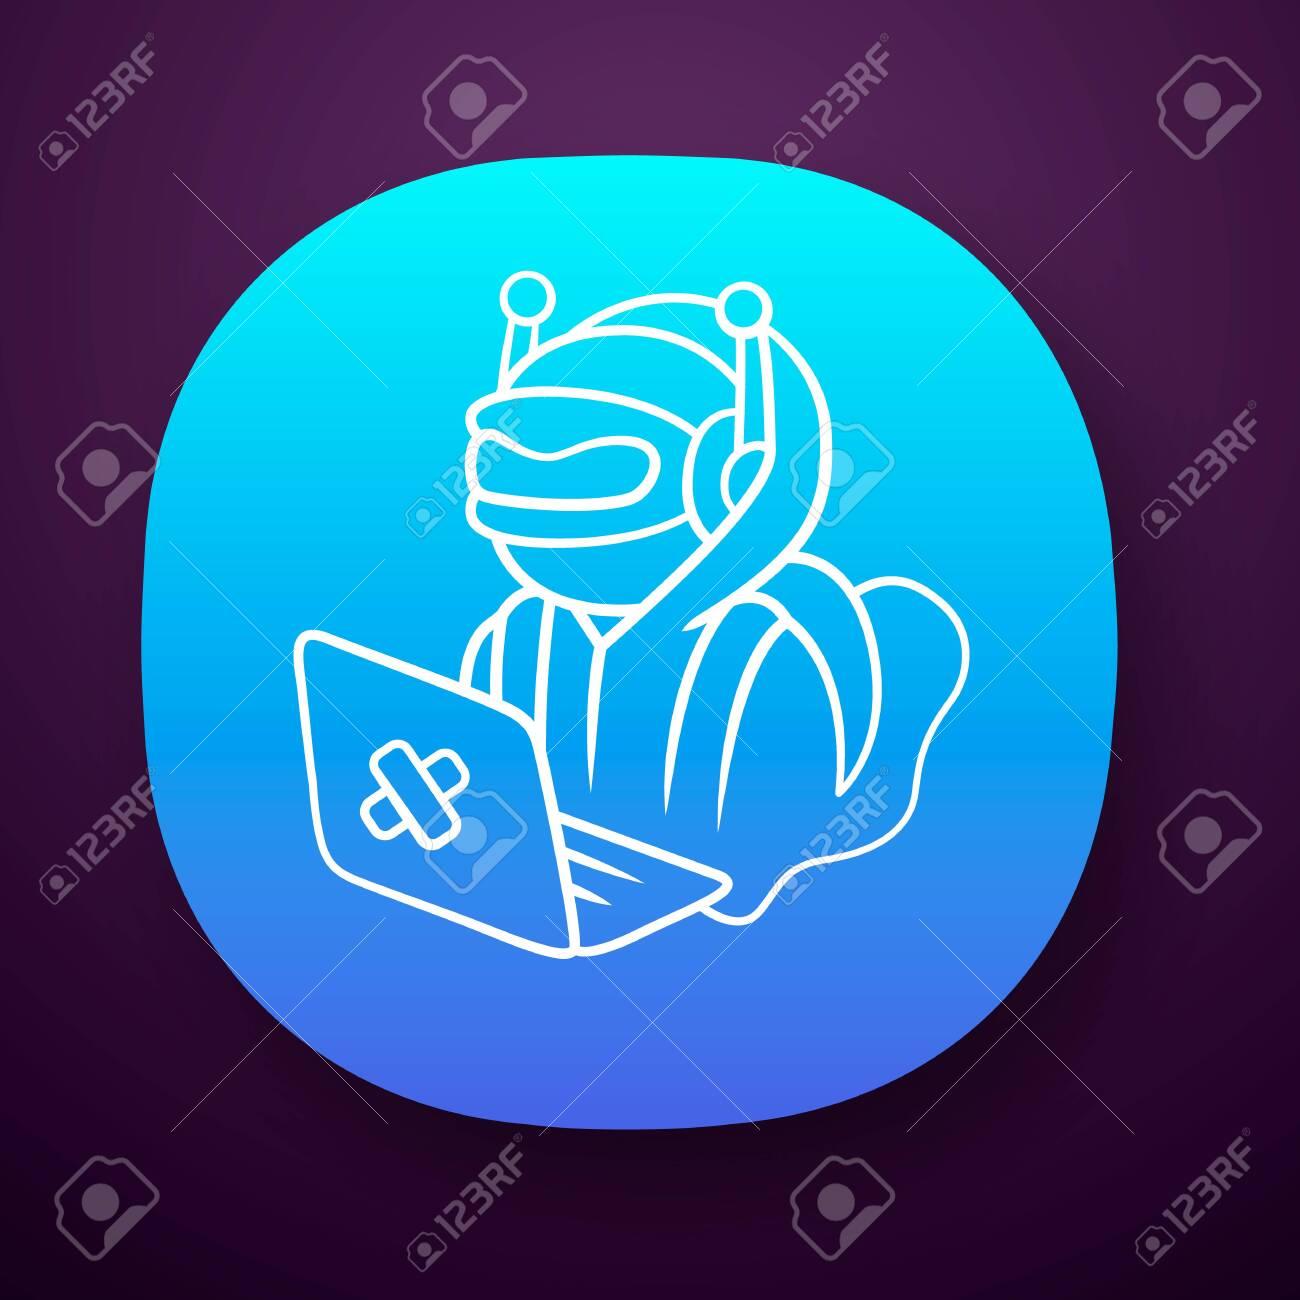 Hacker bot app icon  Virus robot  Cyber pirate attack, crime,